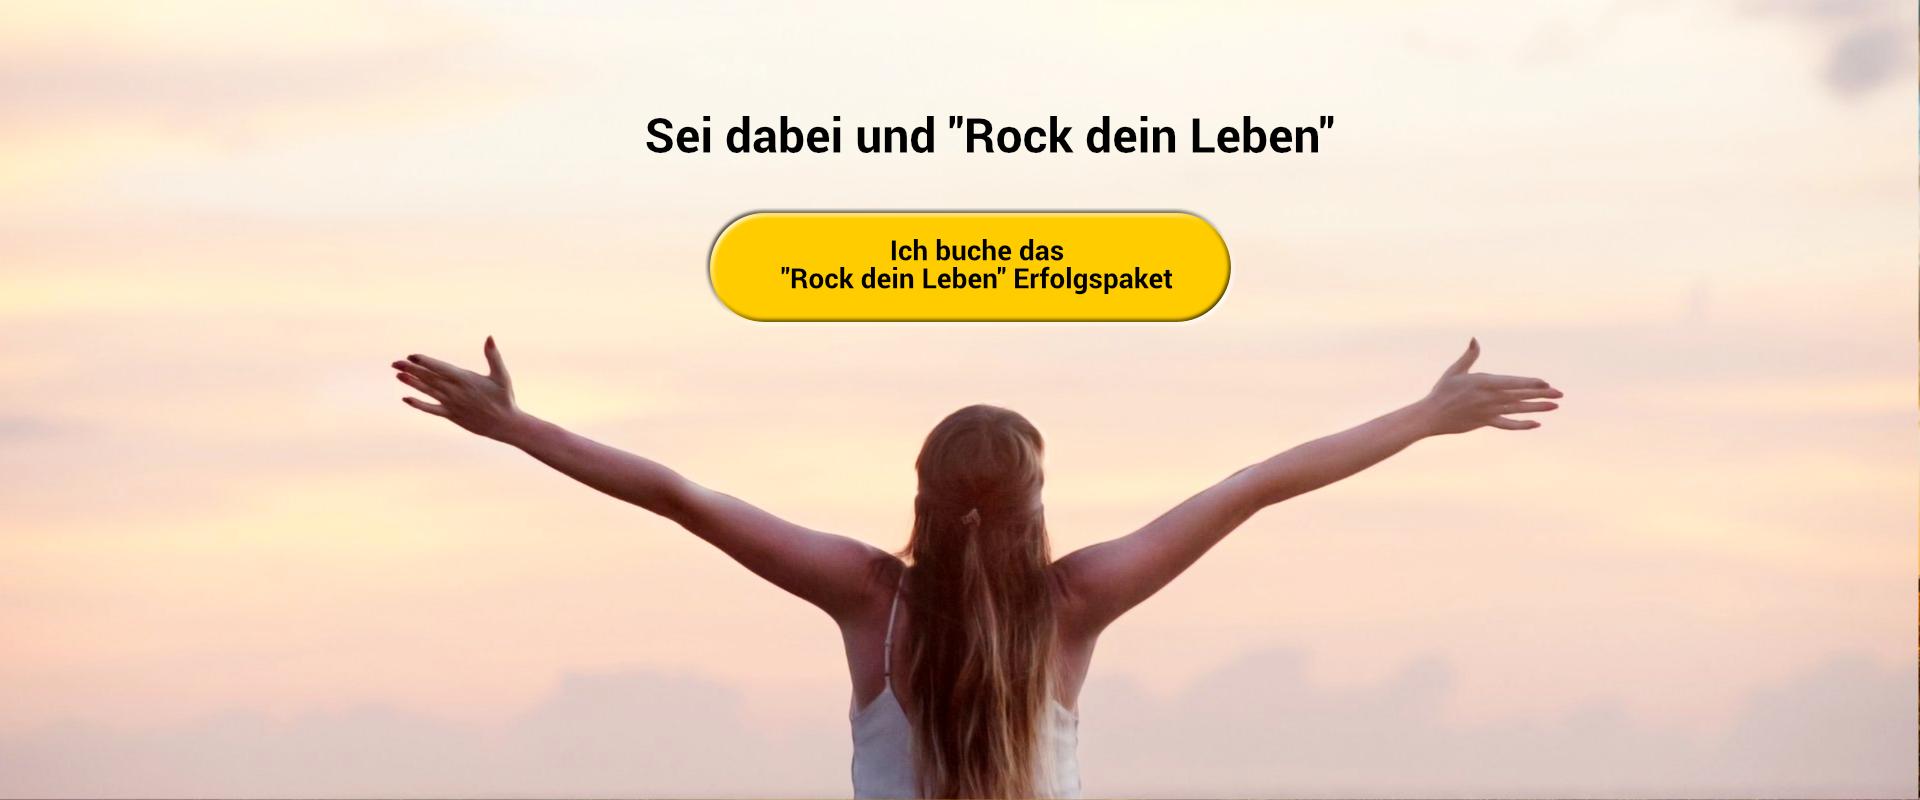 Rock dein Leben